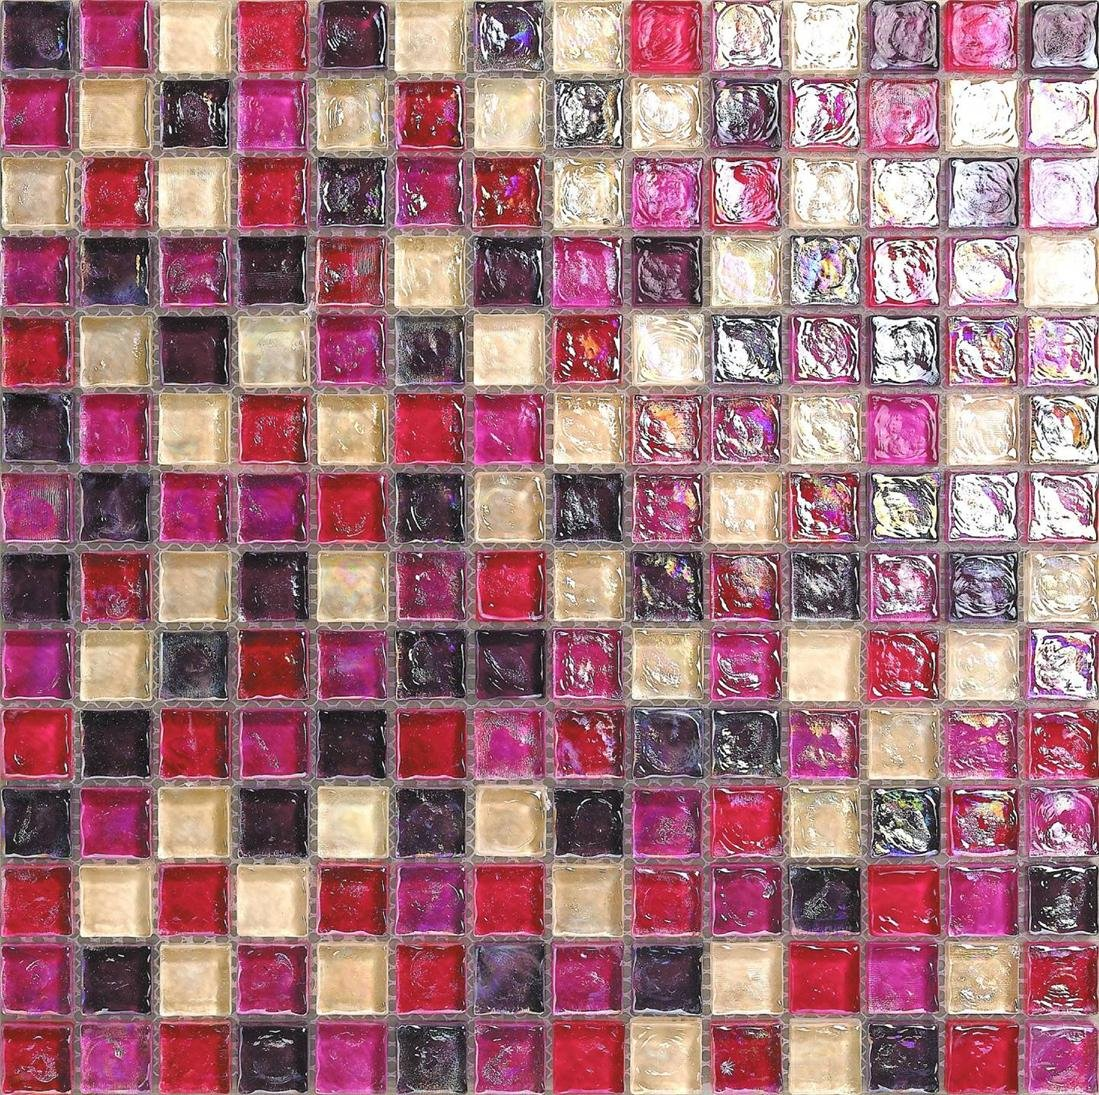 Rosa madre de perla de cristal mosaico azulejos alfombra con efecto de cristal giratorio (MT0027) GTDE